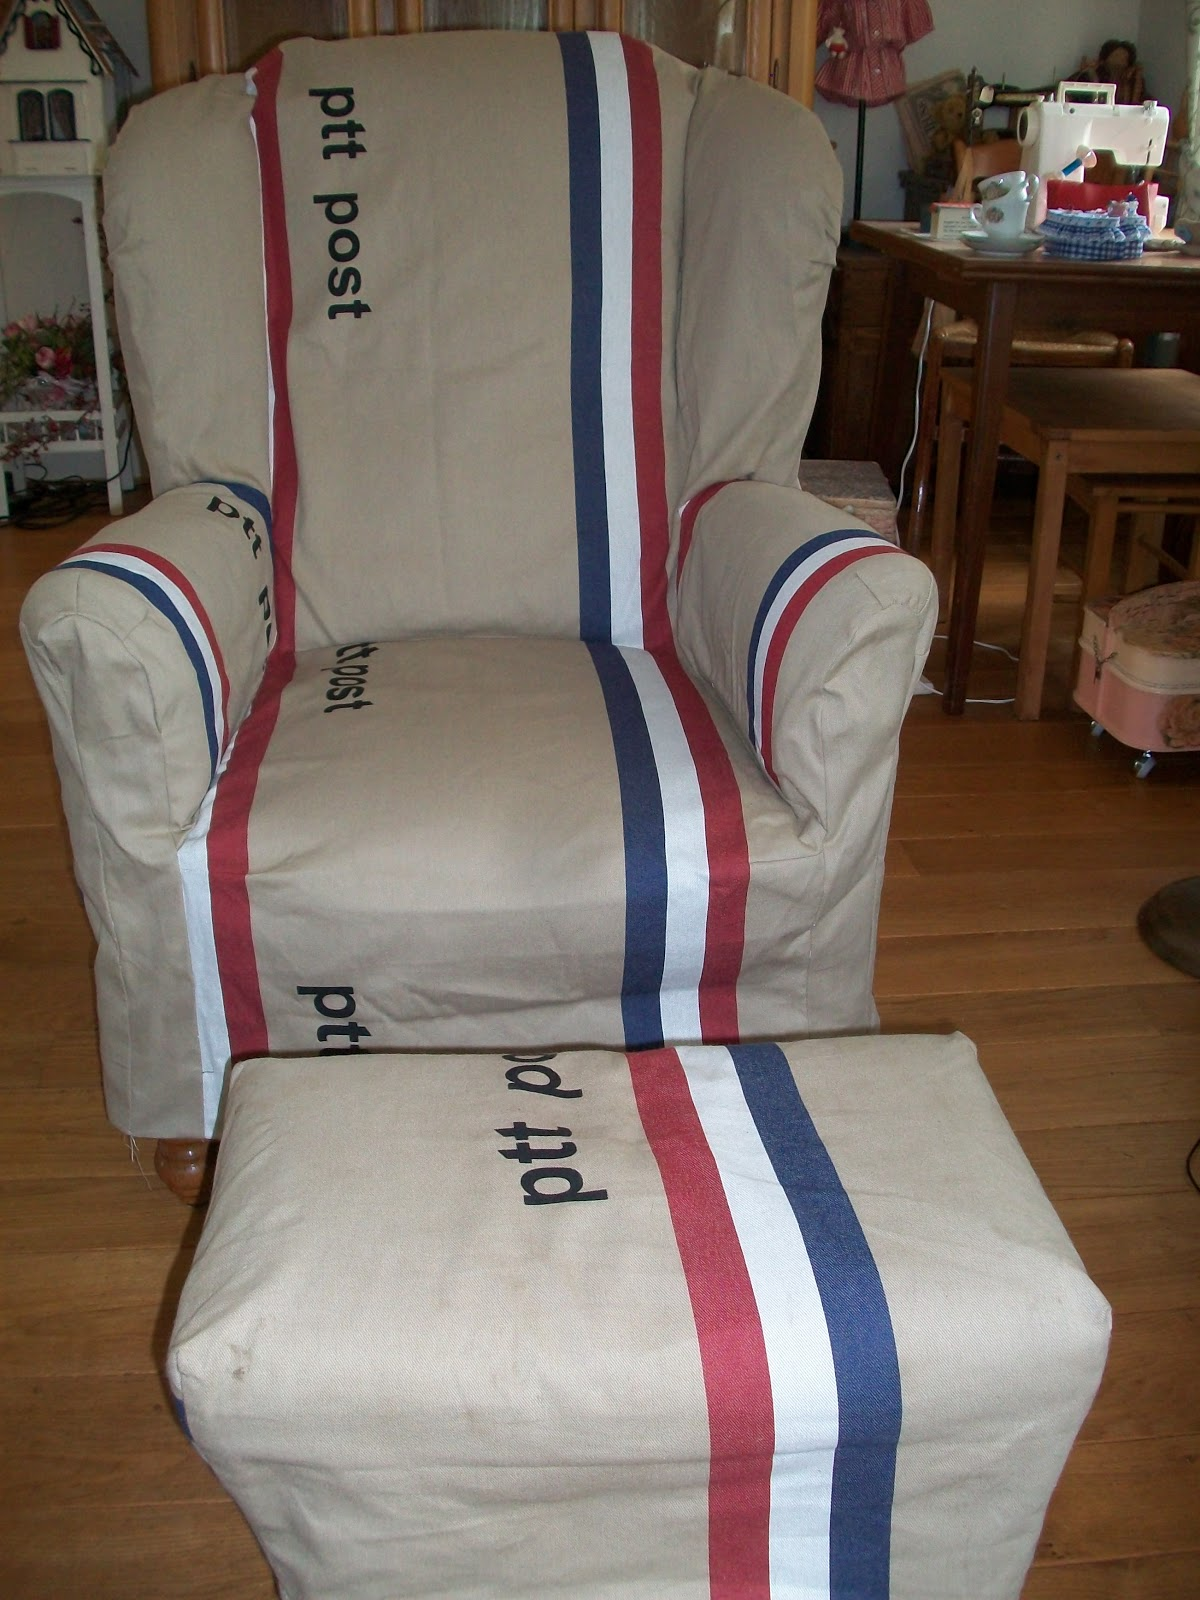 Made By Hennie   Jeans tassen en een PTT stoelhoes